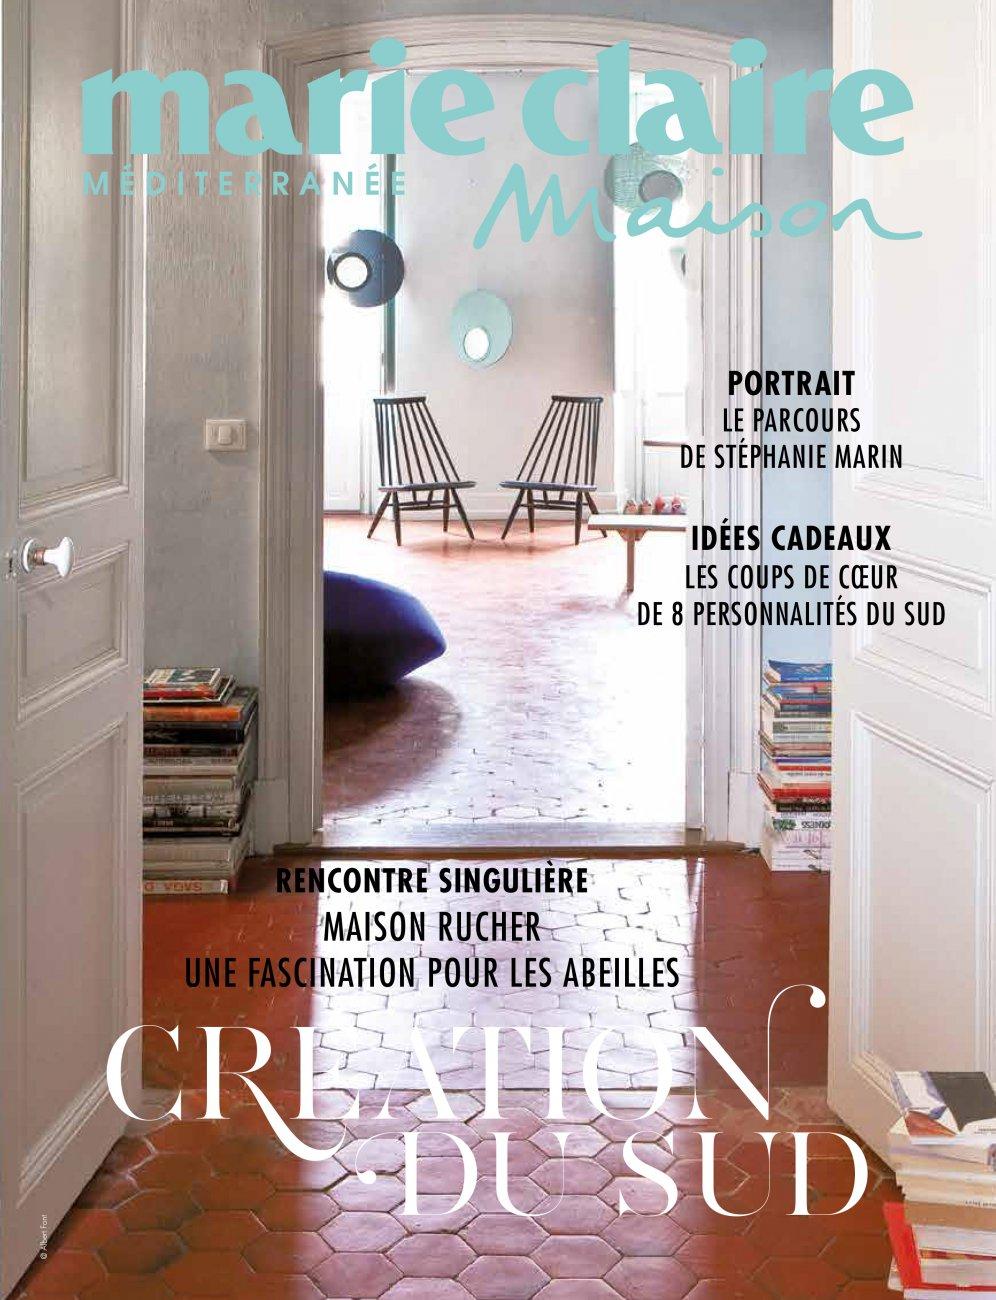 Marie Claire Maison N.490 / December 2016 - January 2017 / Marie Claire Maison